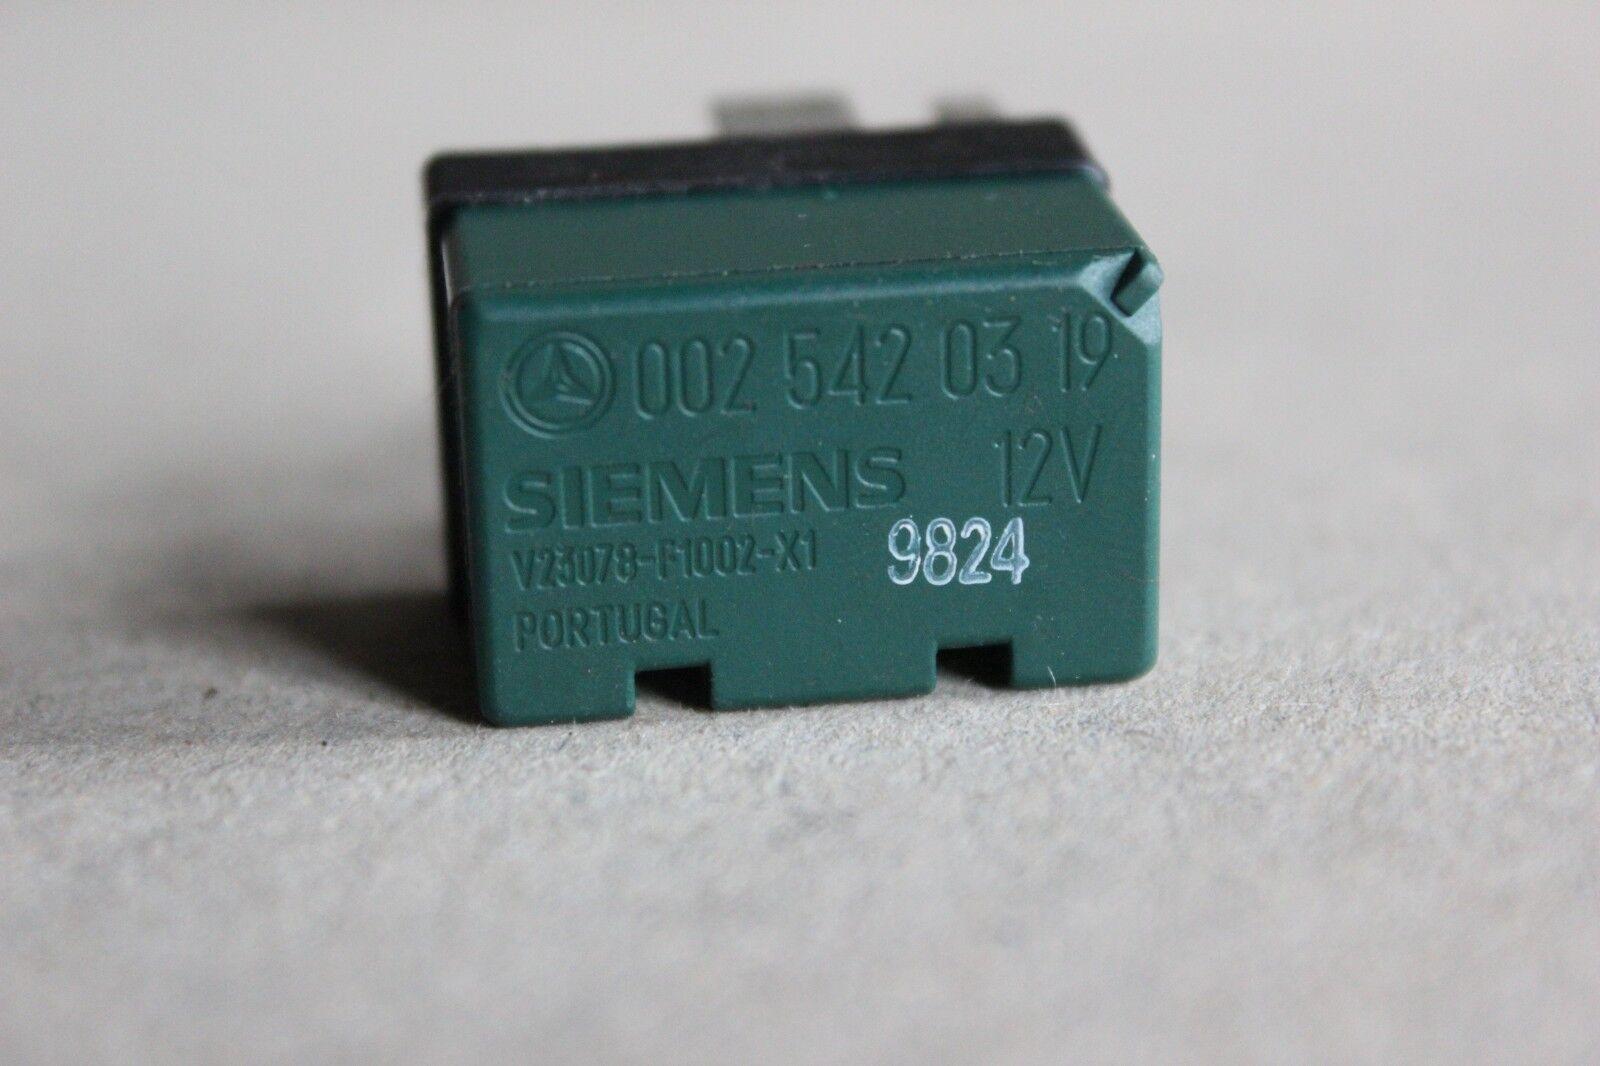 V23078-F1002-X1 /_TESTED RELAY/_ Mercedes 12V 6Pin # 0025420319